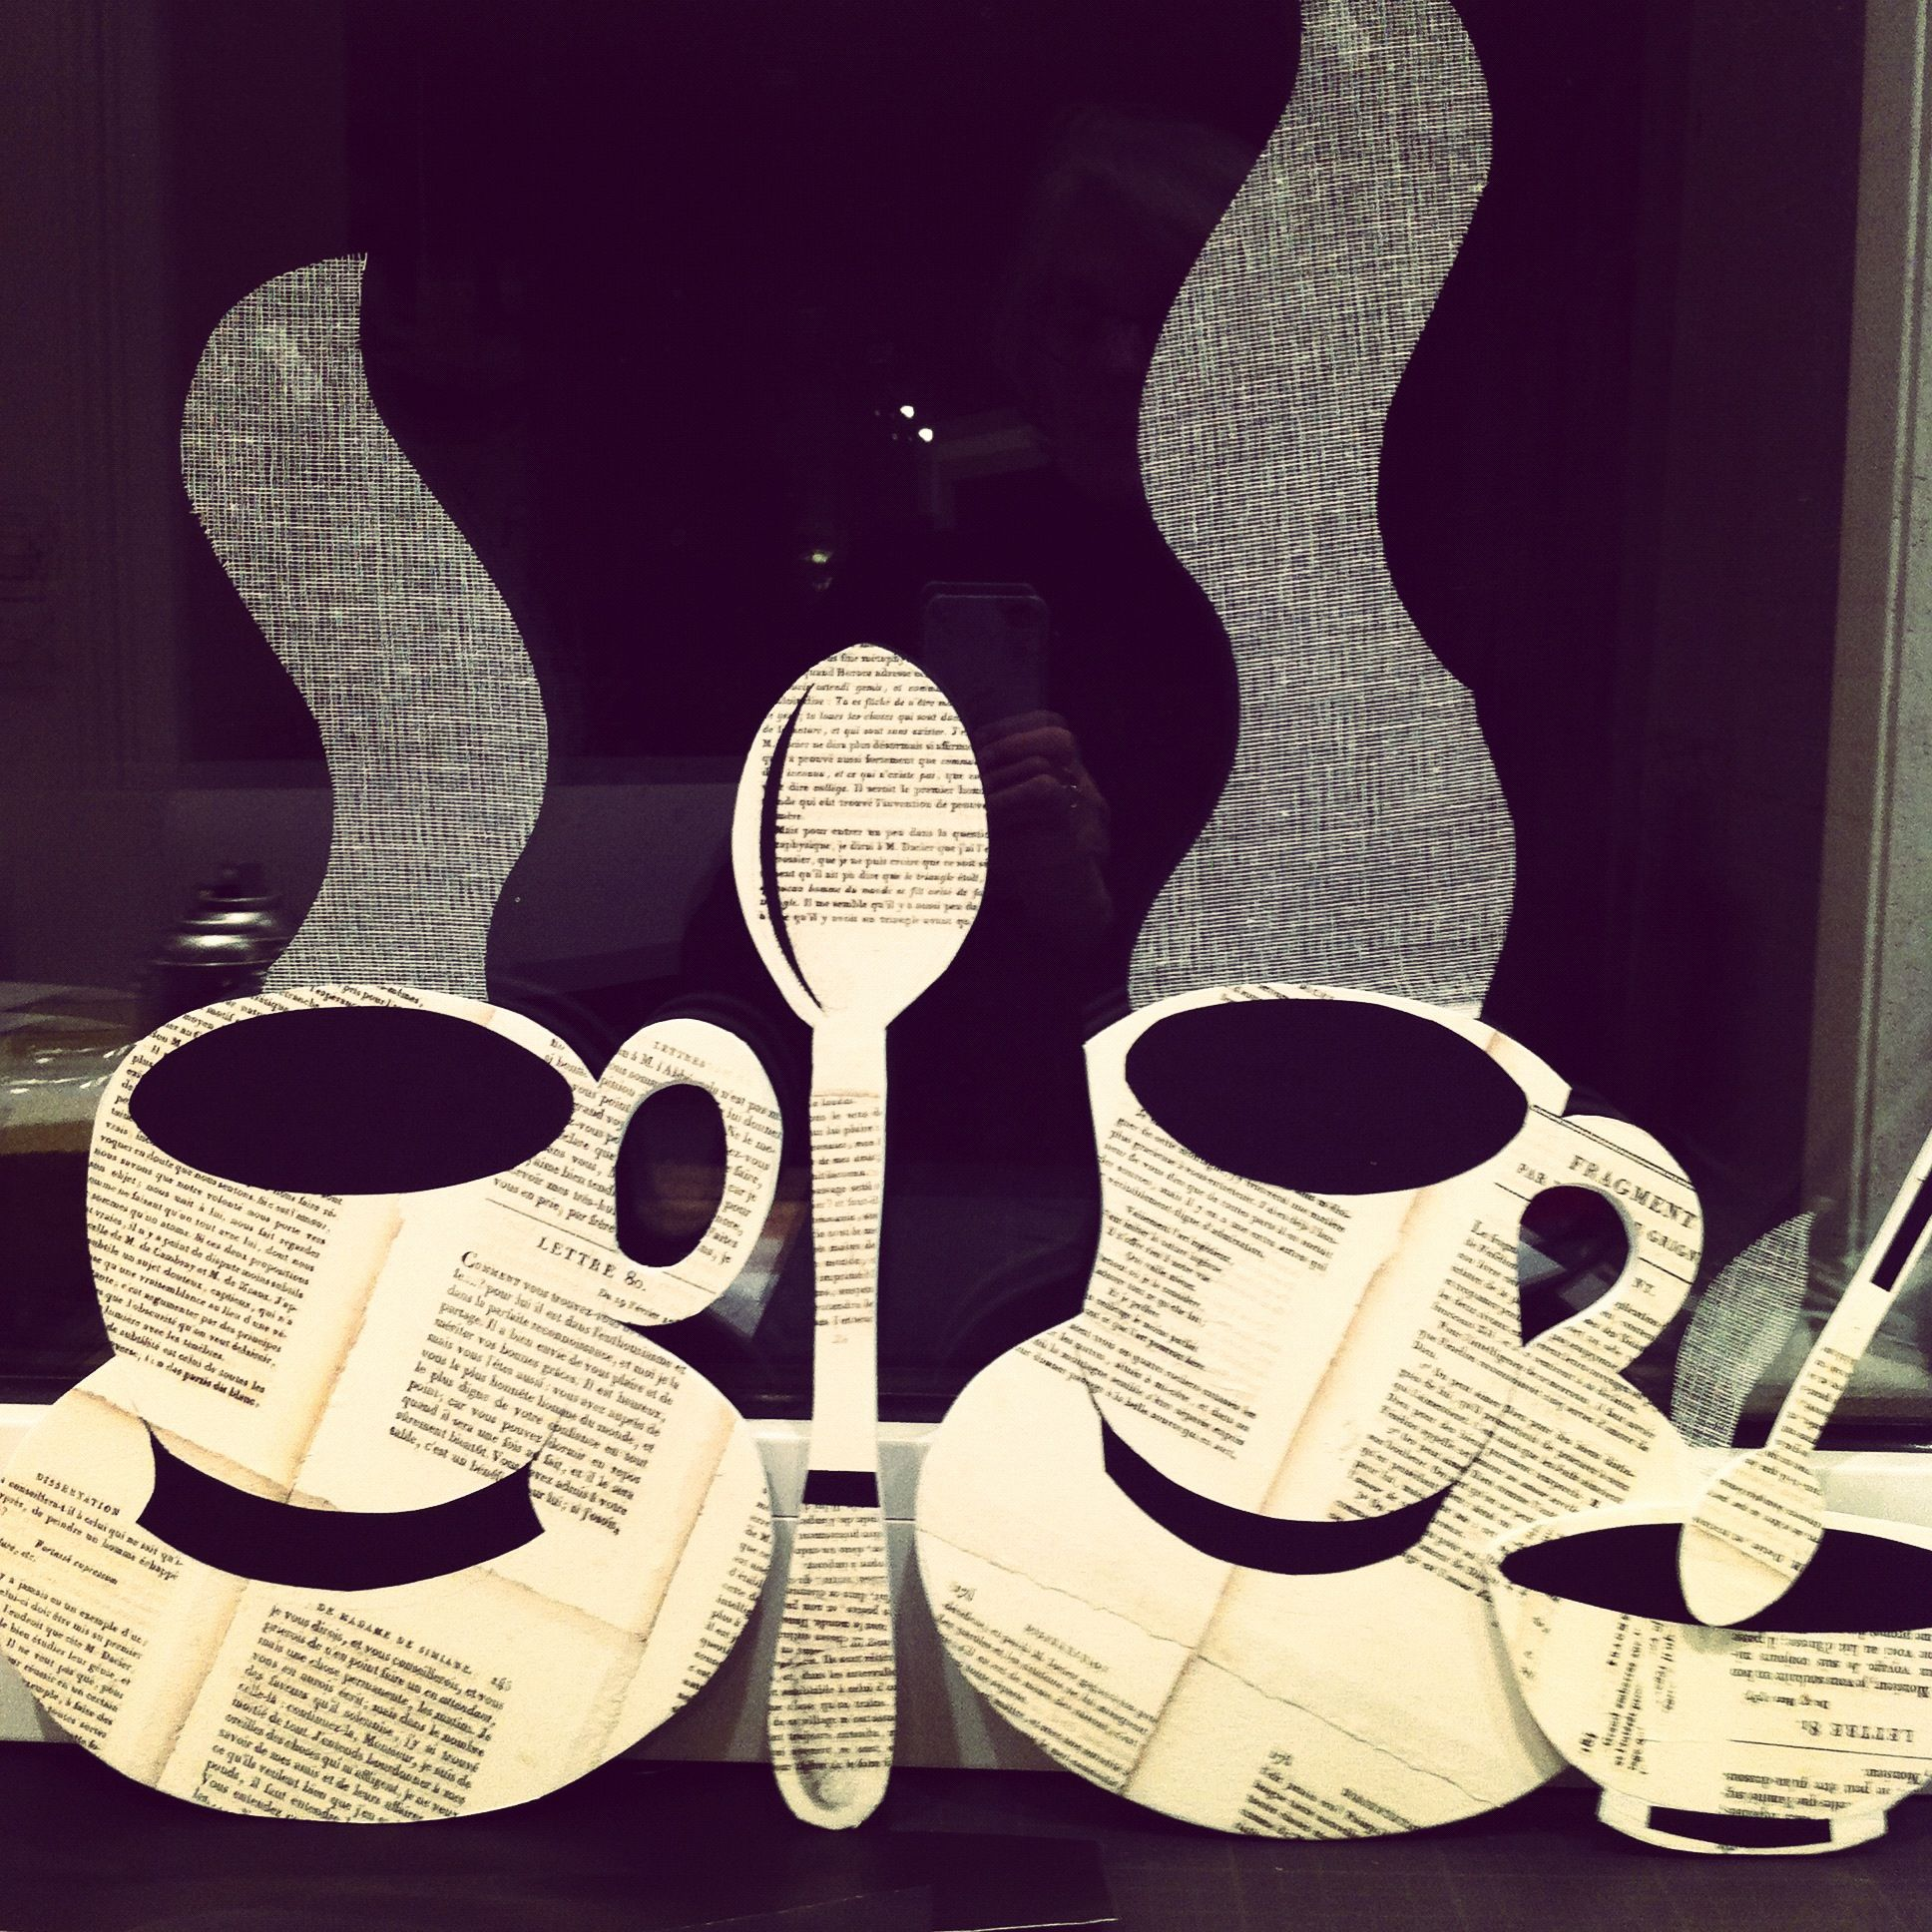 Tea cups for Picorette 12.12.